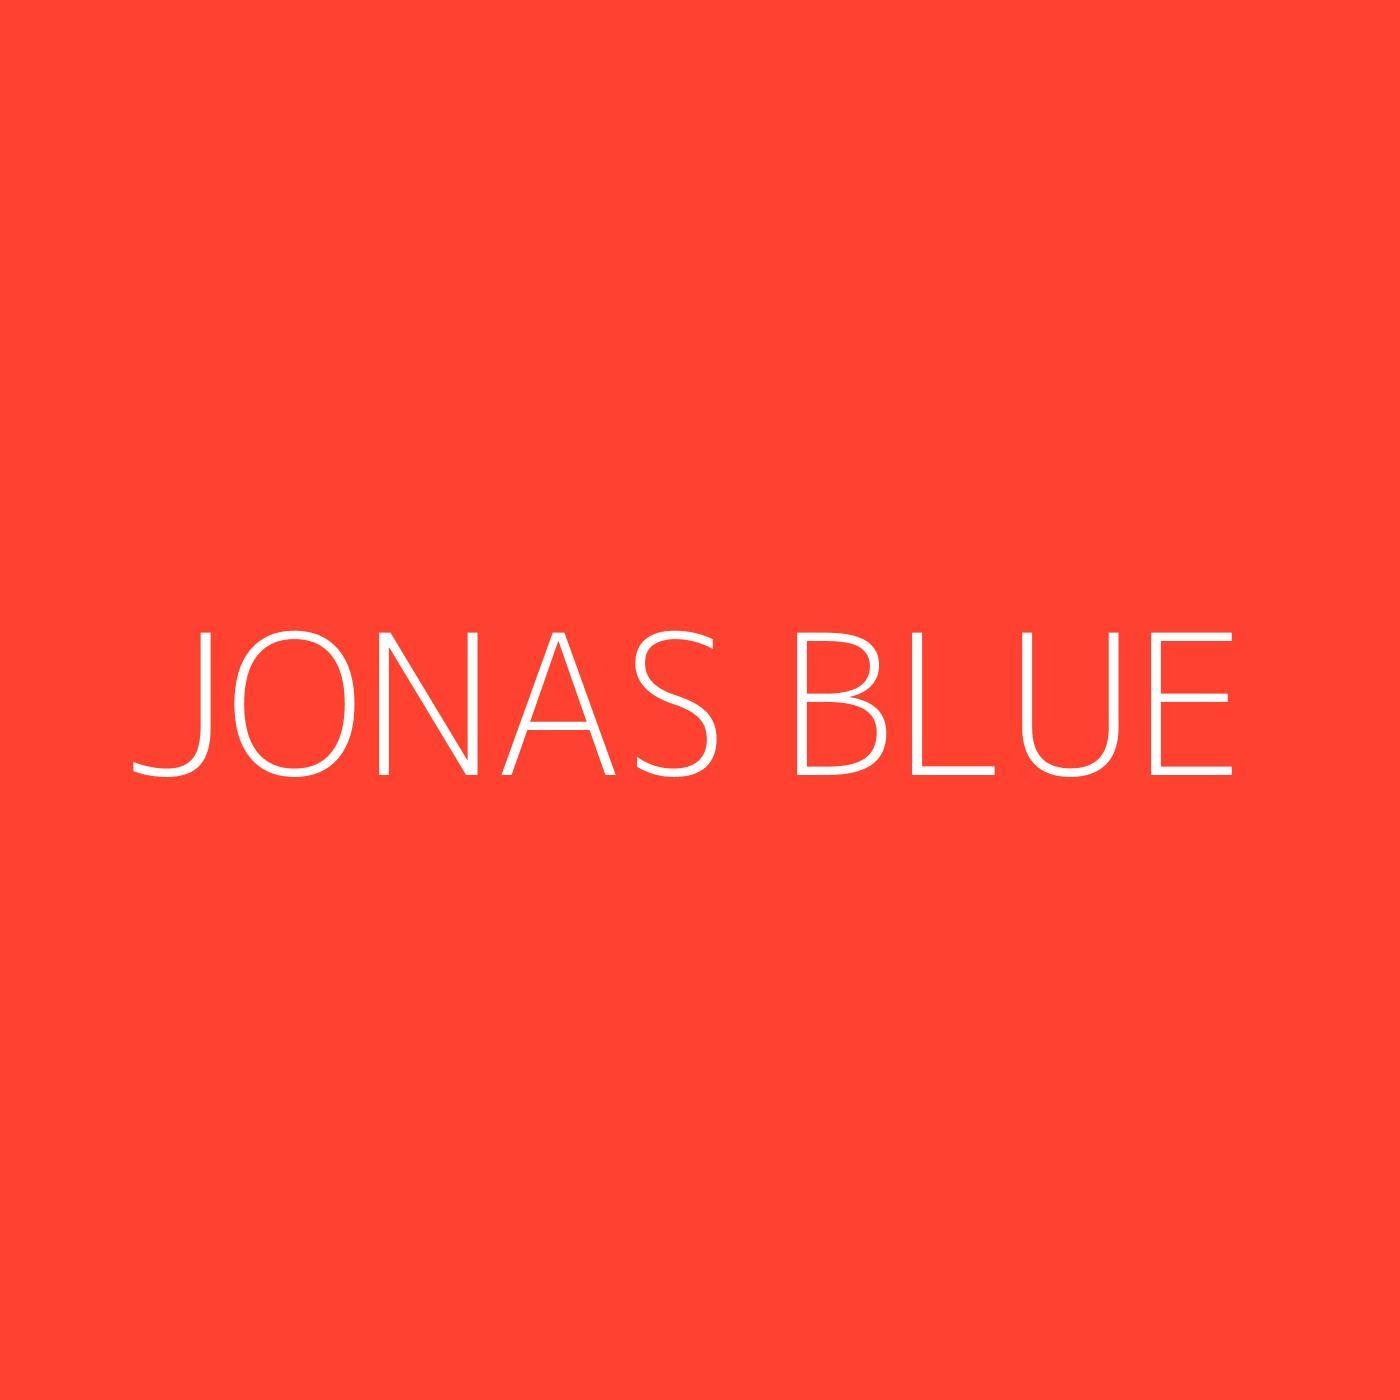 Jonas Blue Playlist Artwork